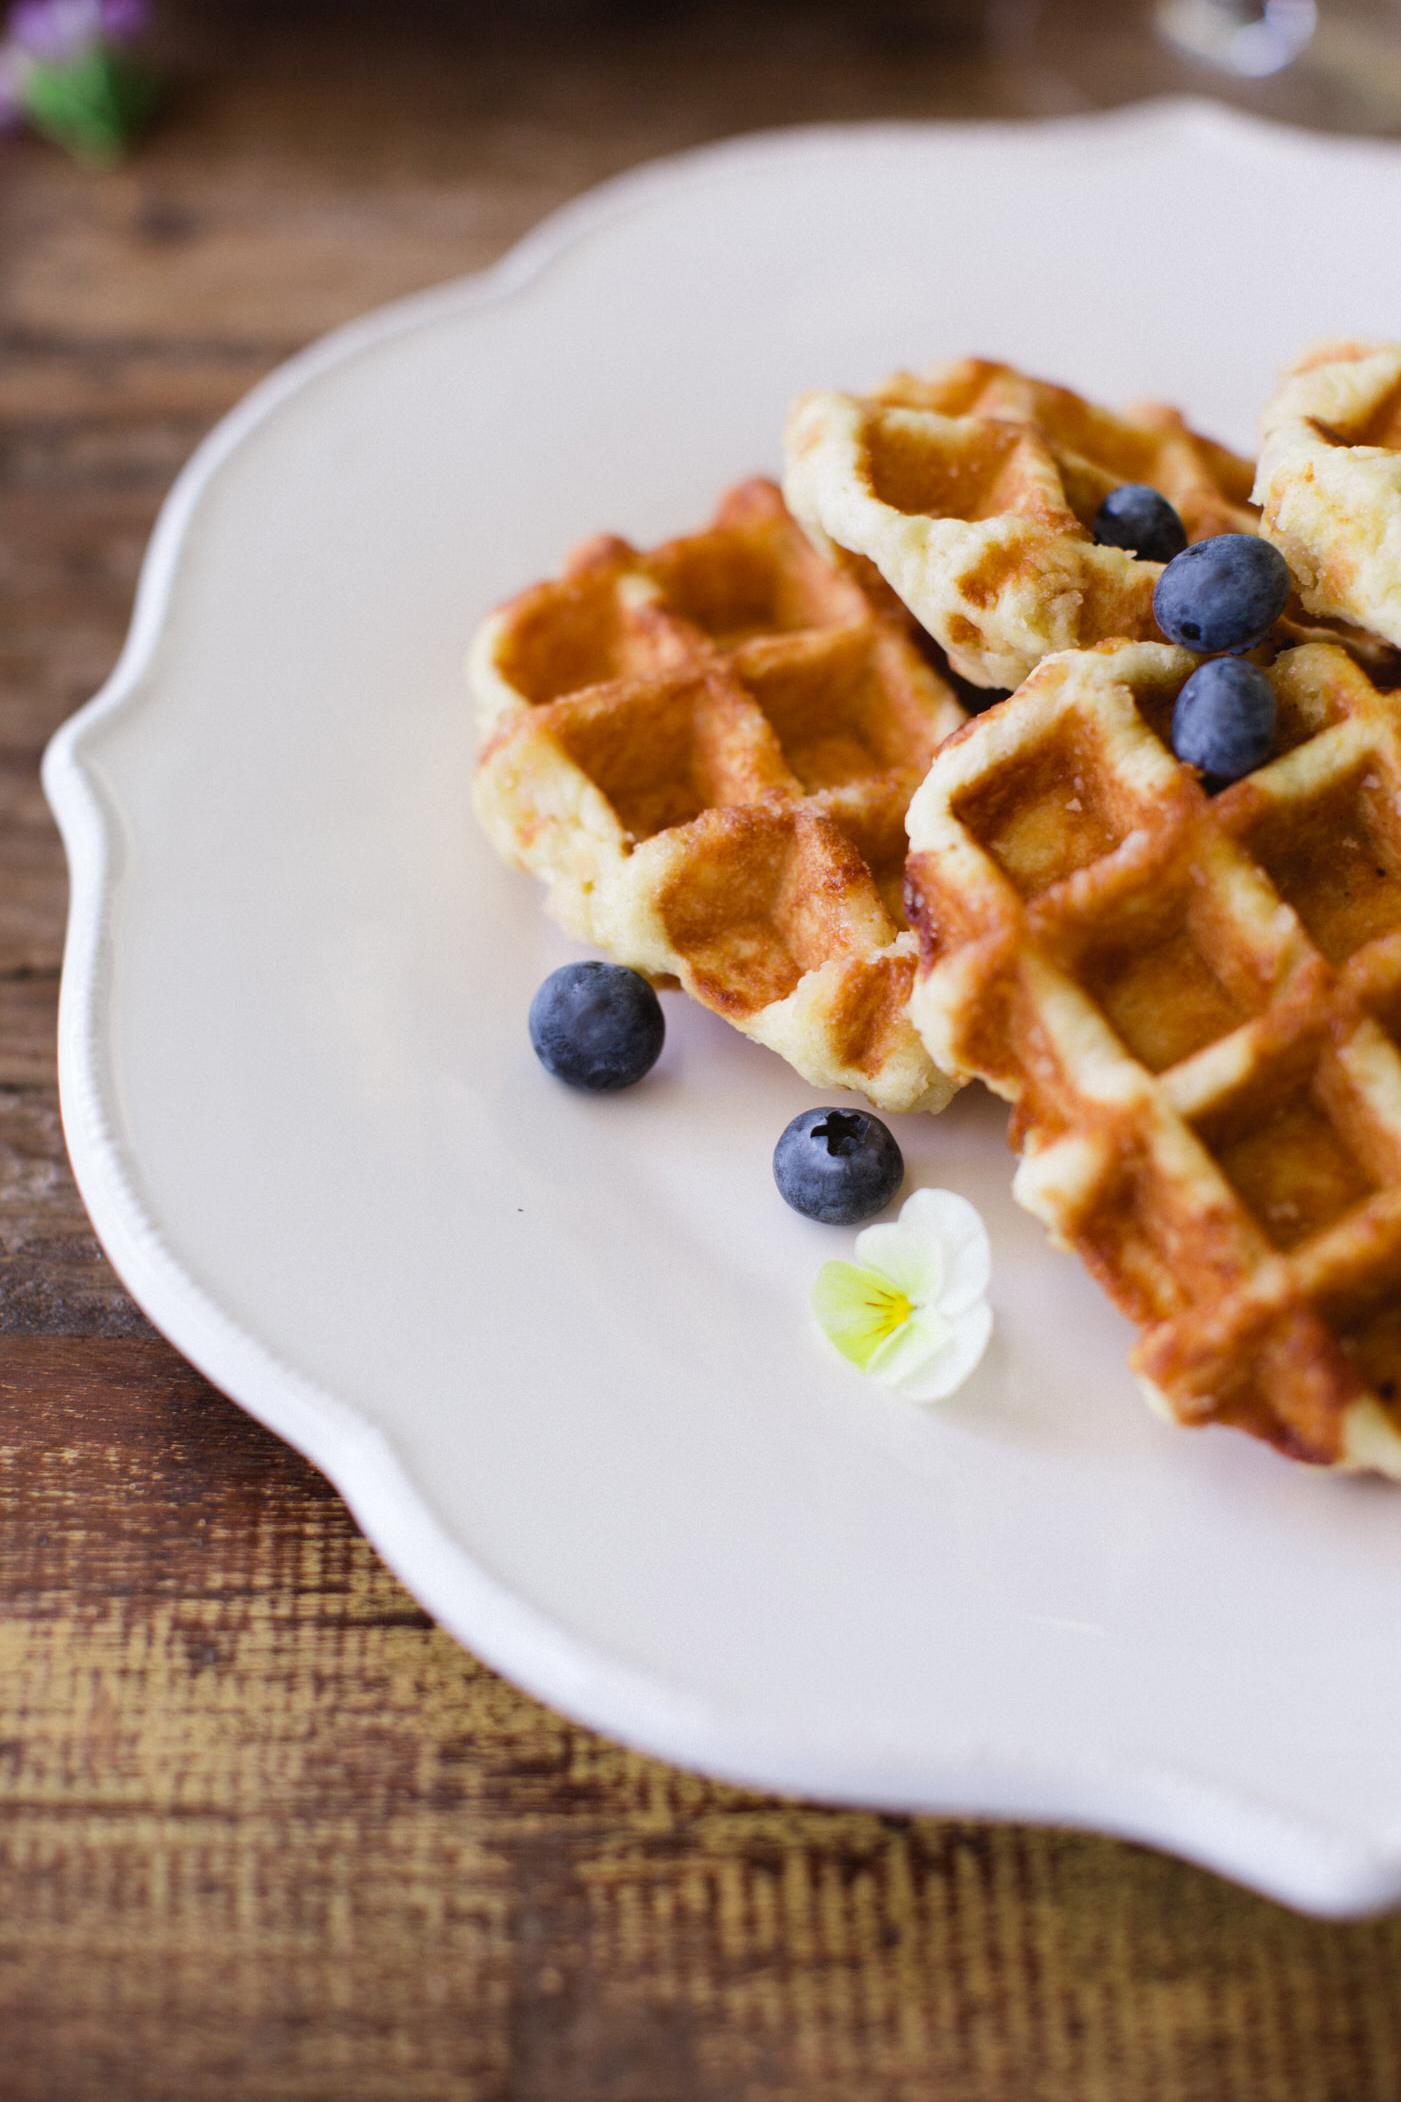 dairy-free gluten-free pancakes or waffles. Medical Medium recipe. Photo by Judith Rae.